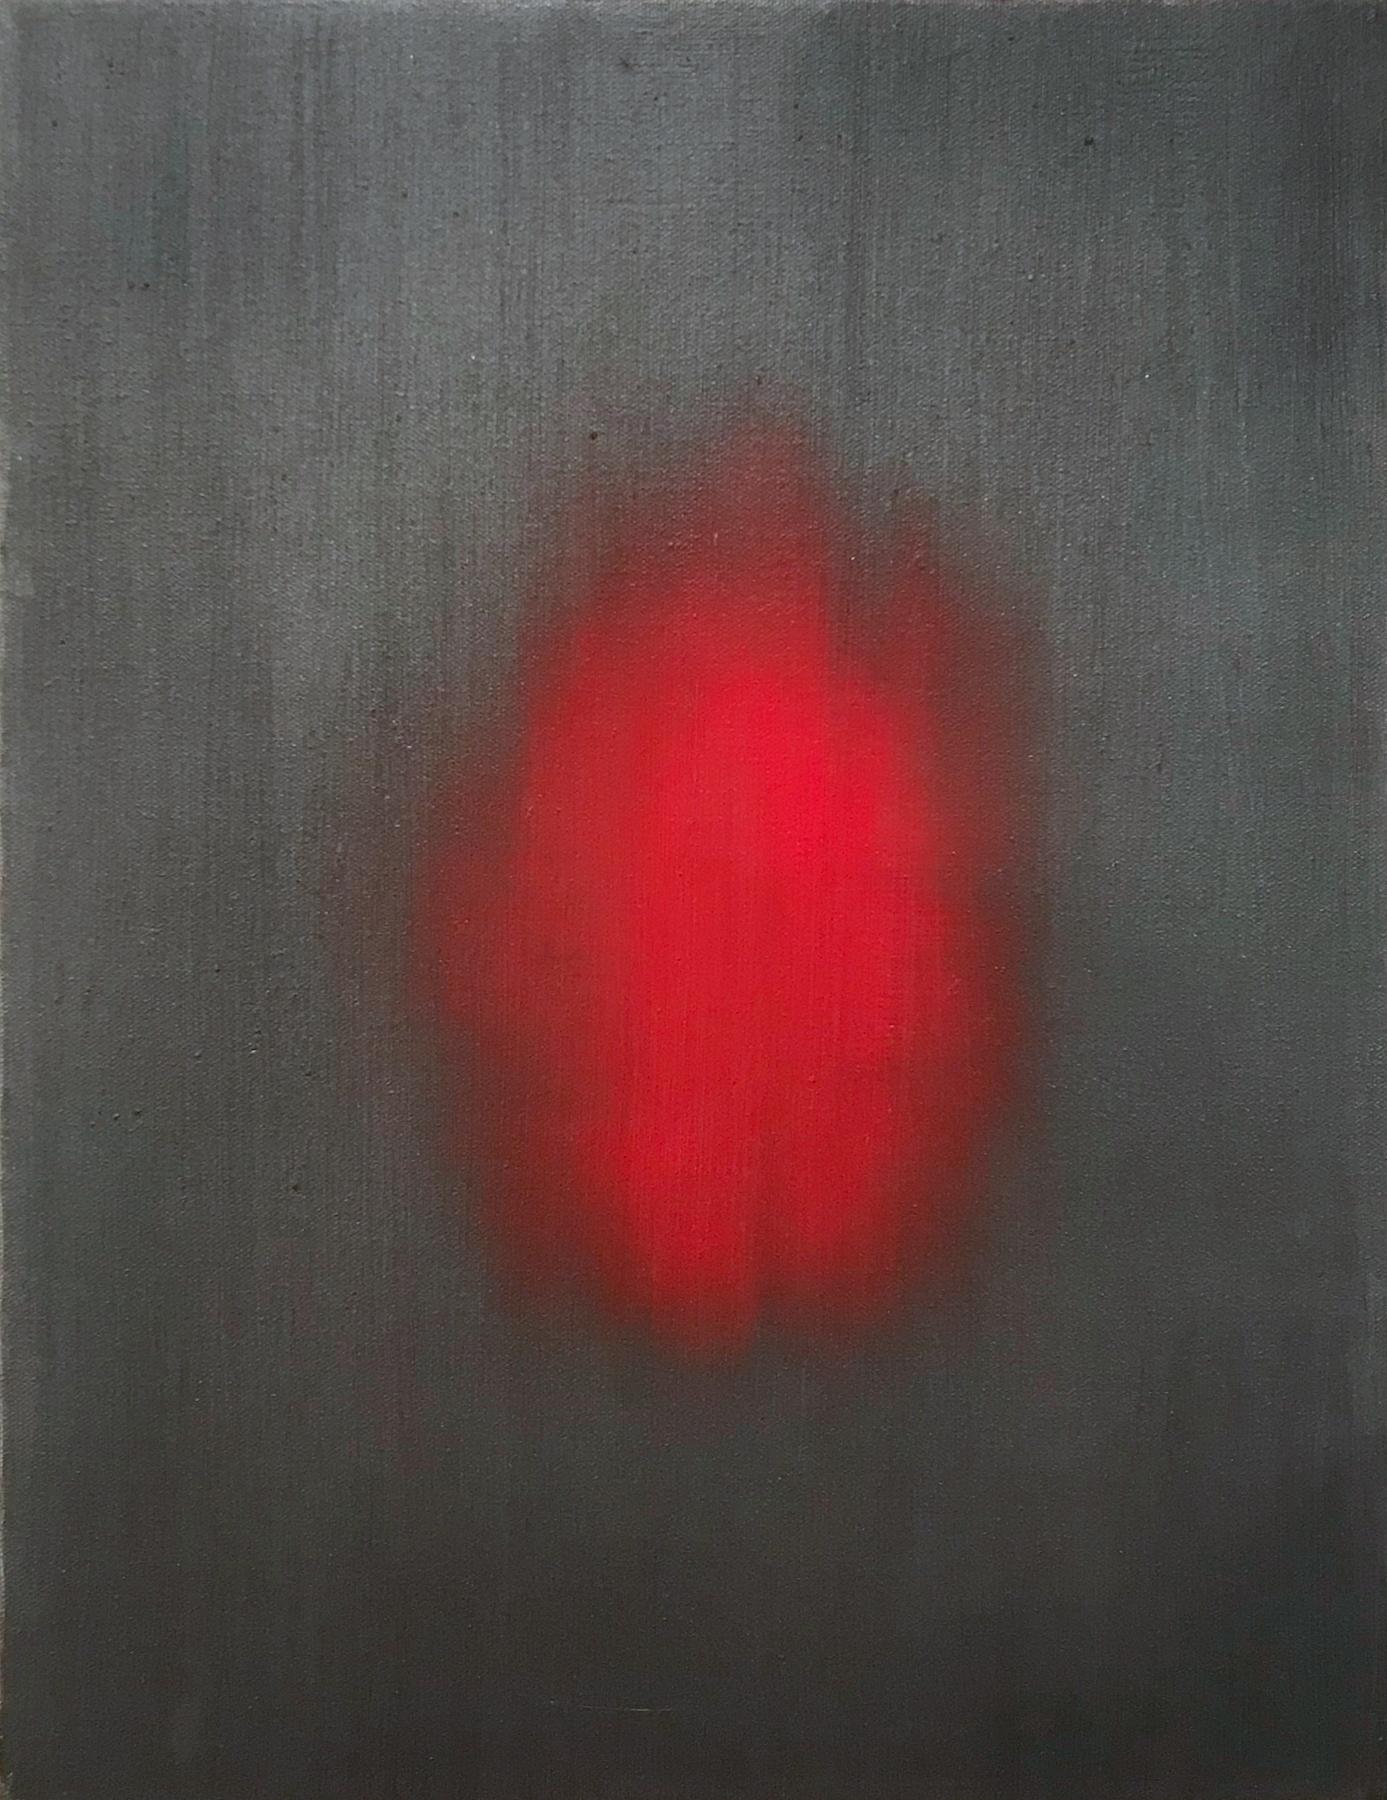 Ross Bleckner,  Untitled  1994 18 x 12 in Oil on canvas